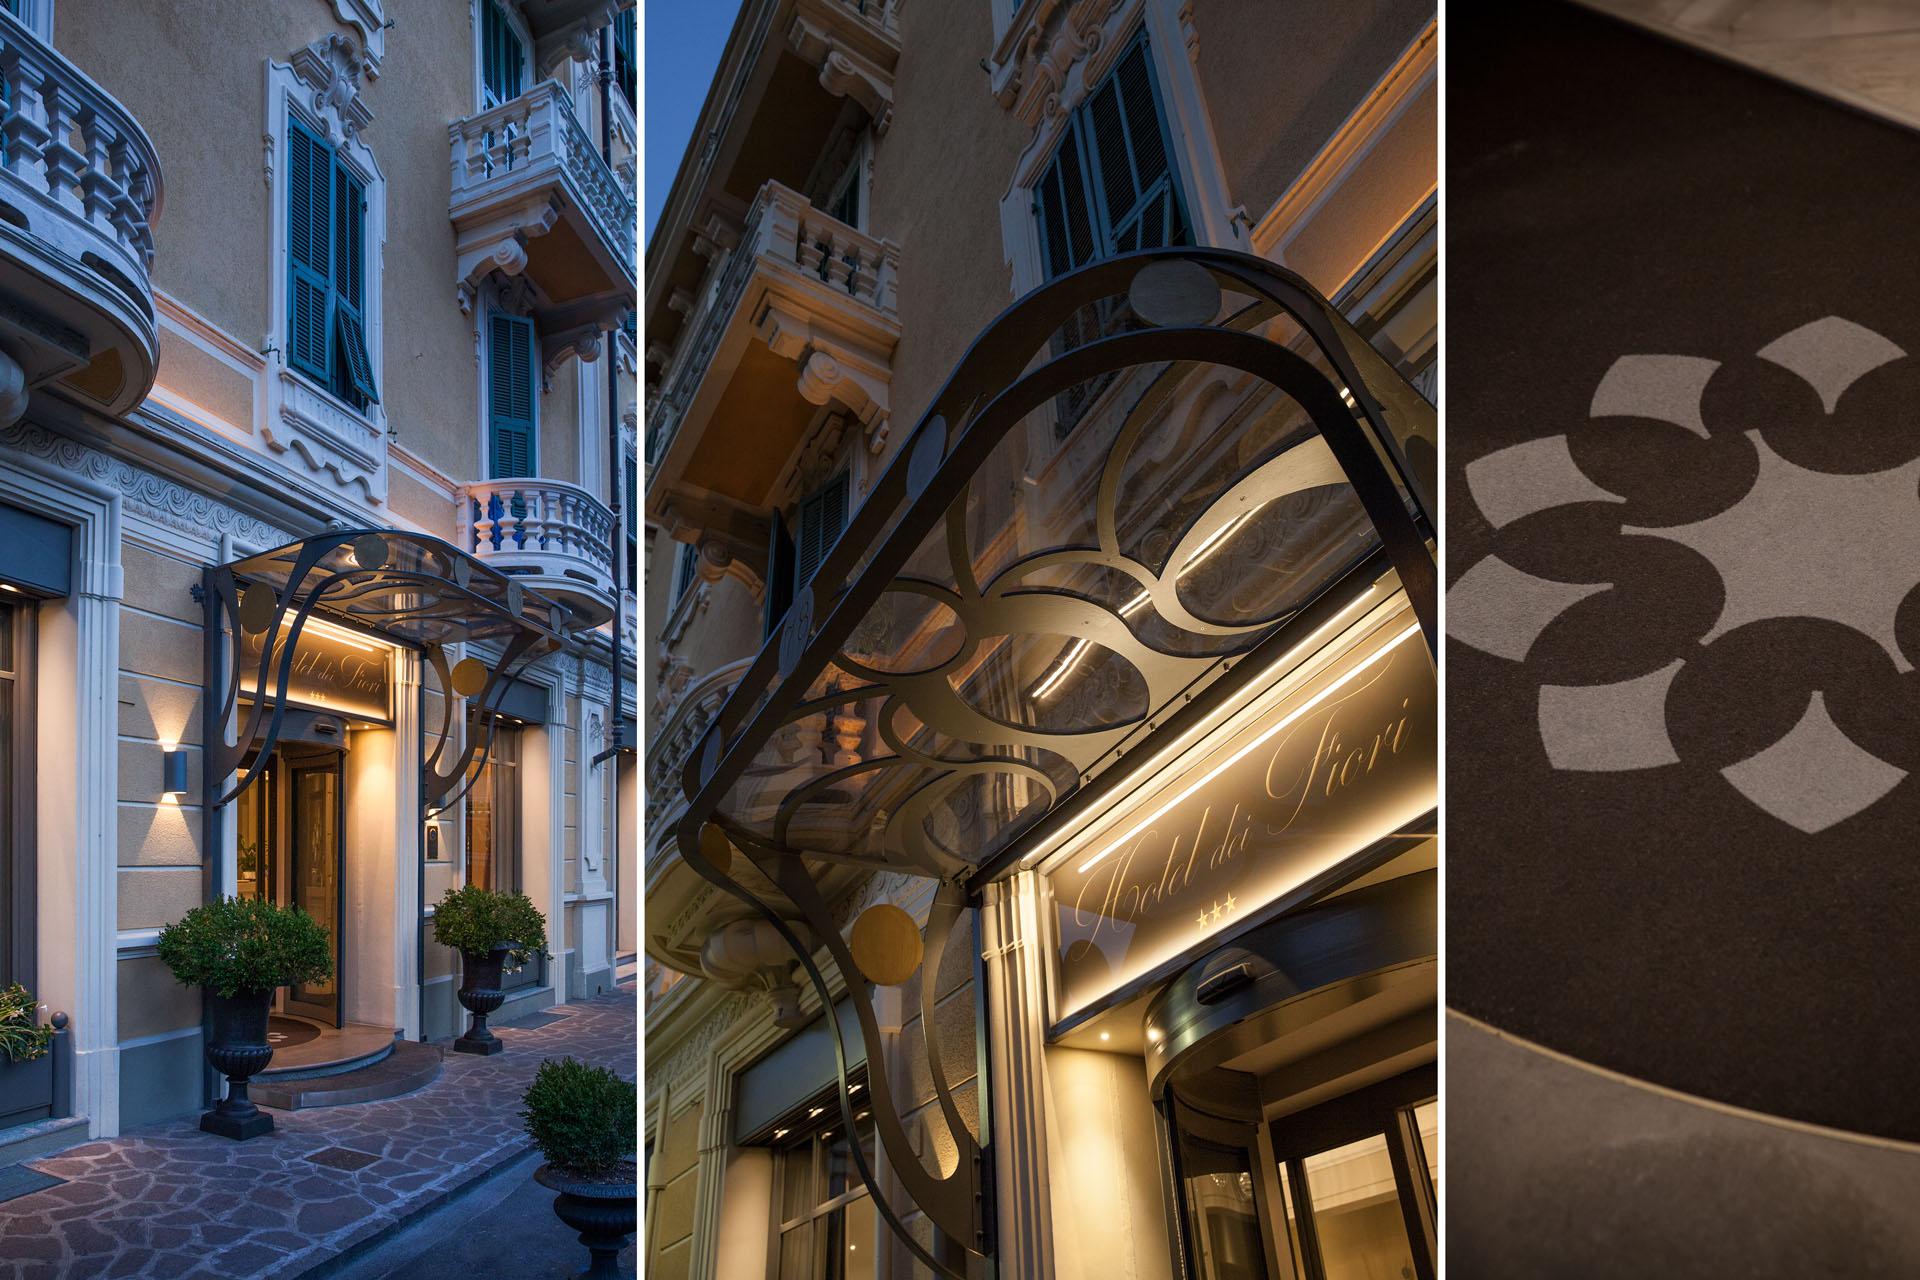 Hotel Dei Fiori.Hotel Dei Fiori Hotel Alassio Mare Albergo Benessere Liguria Hotel